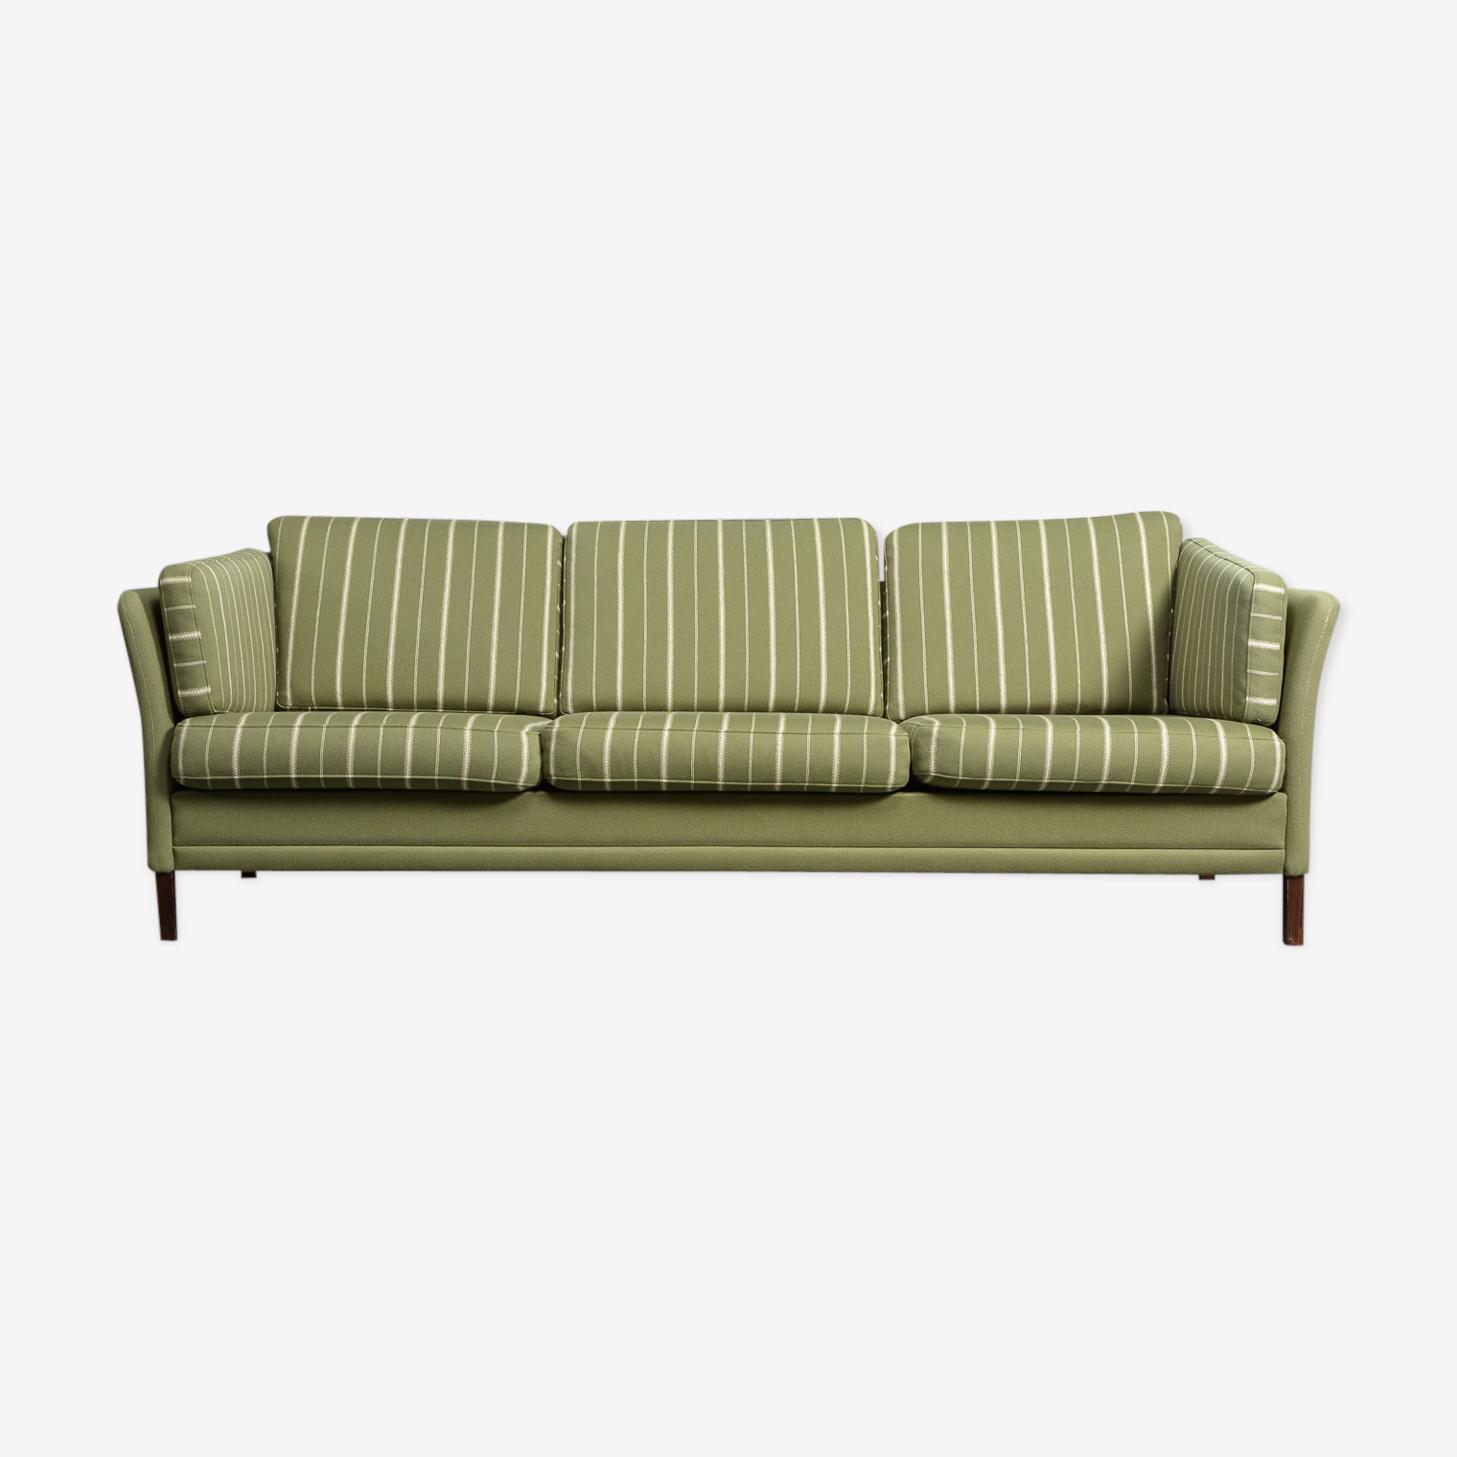 Scandinavian sofa 1960